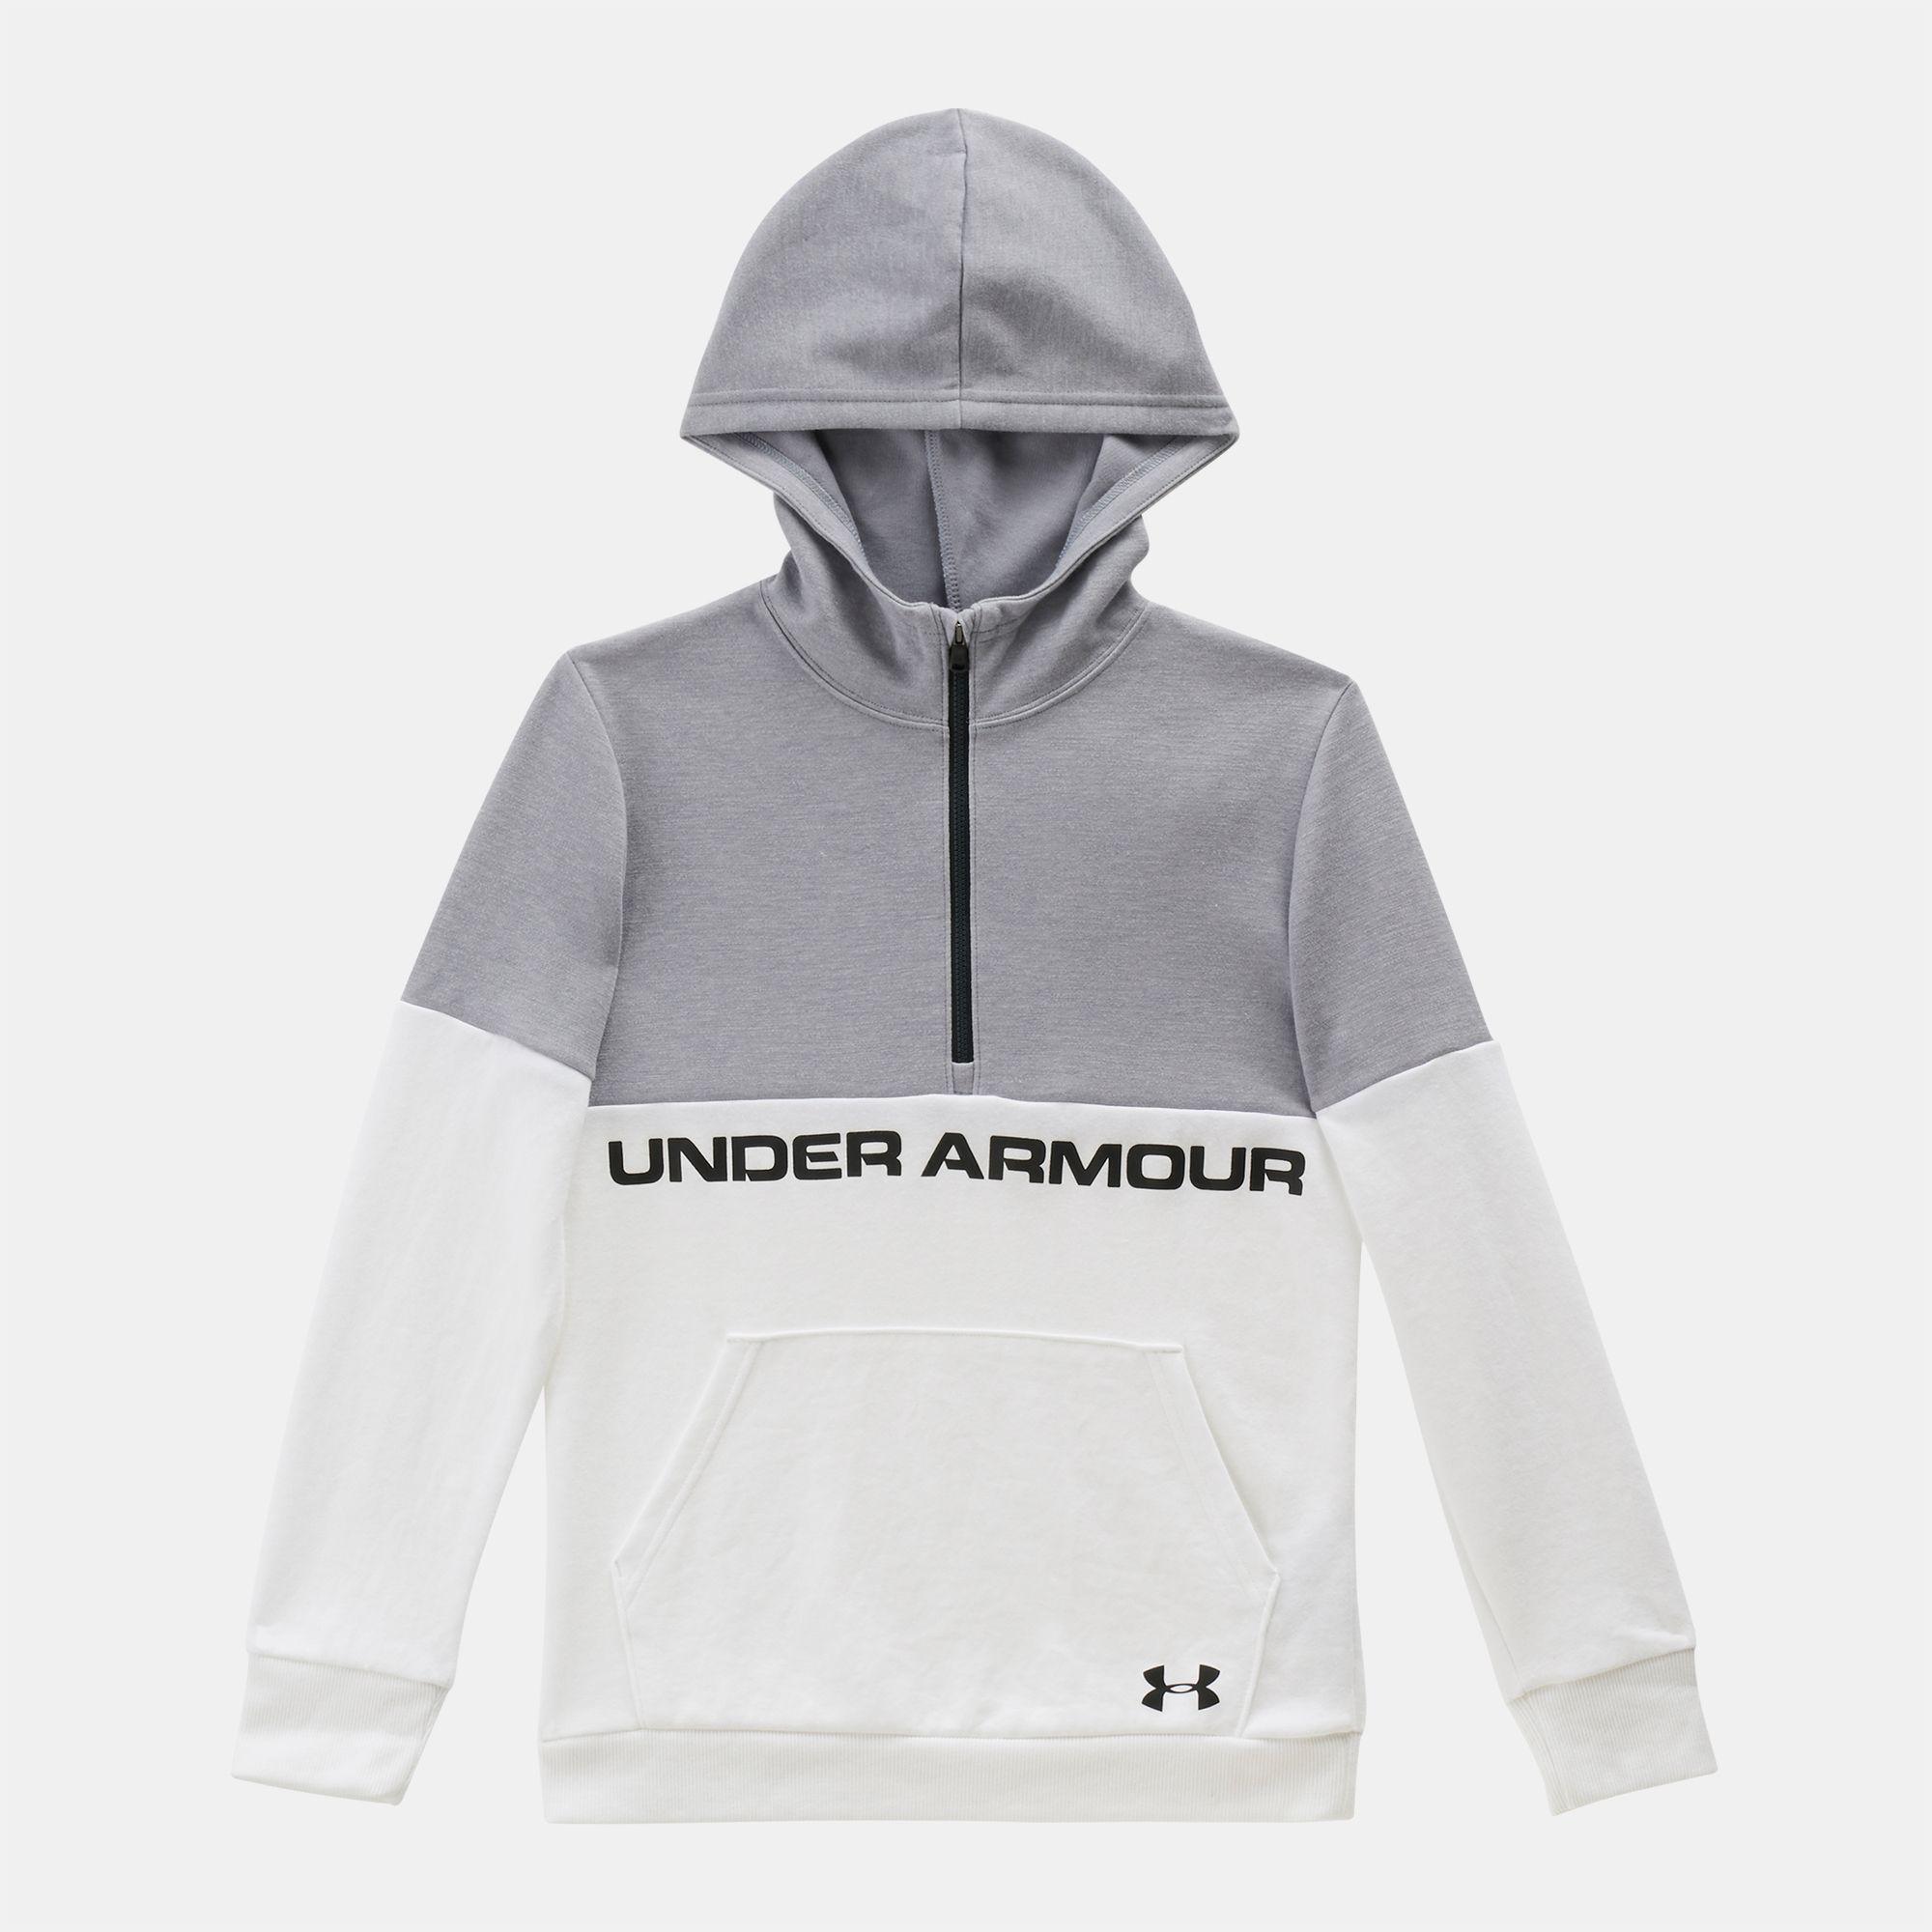 Reebok Boys Sporty Double Knit Zip-up Hooded Jacket Jacket